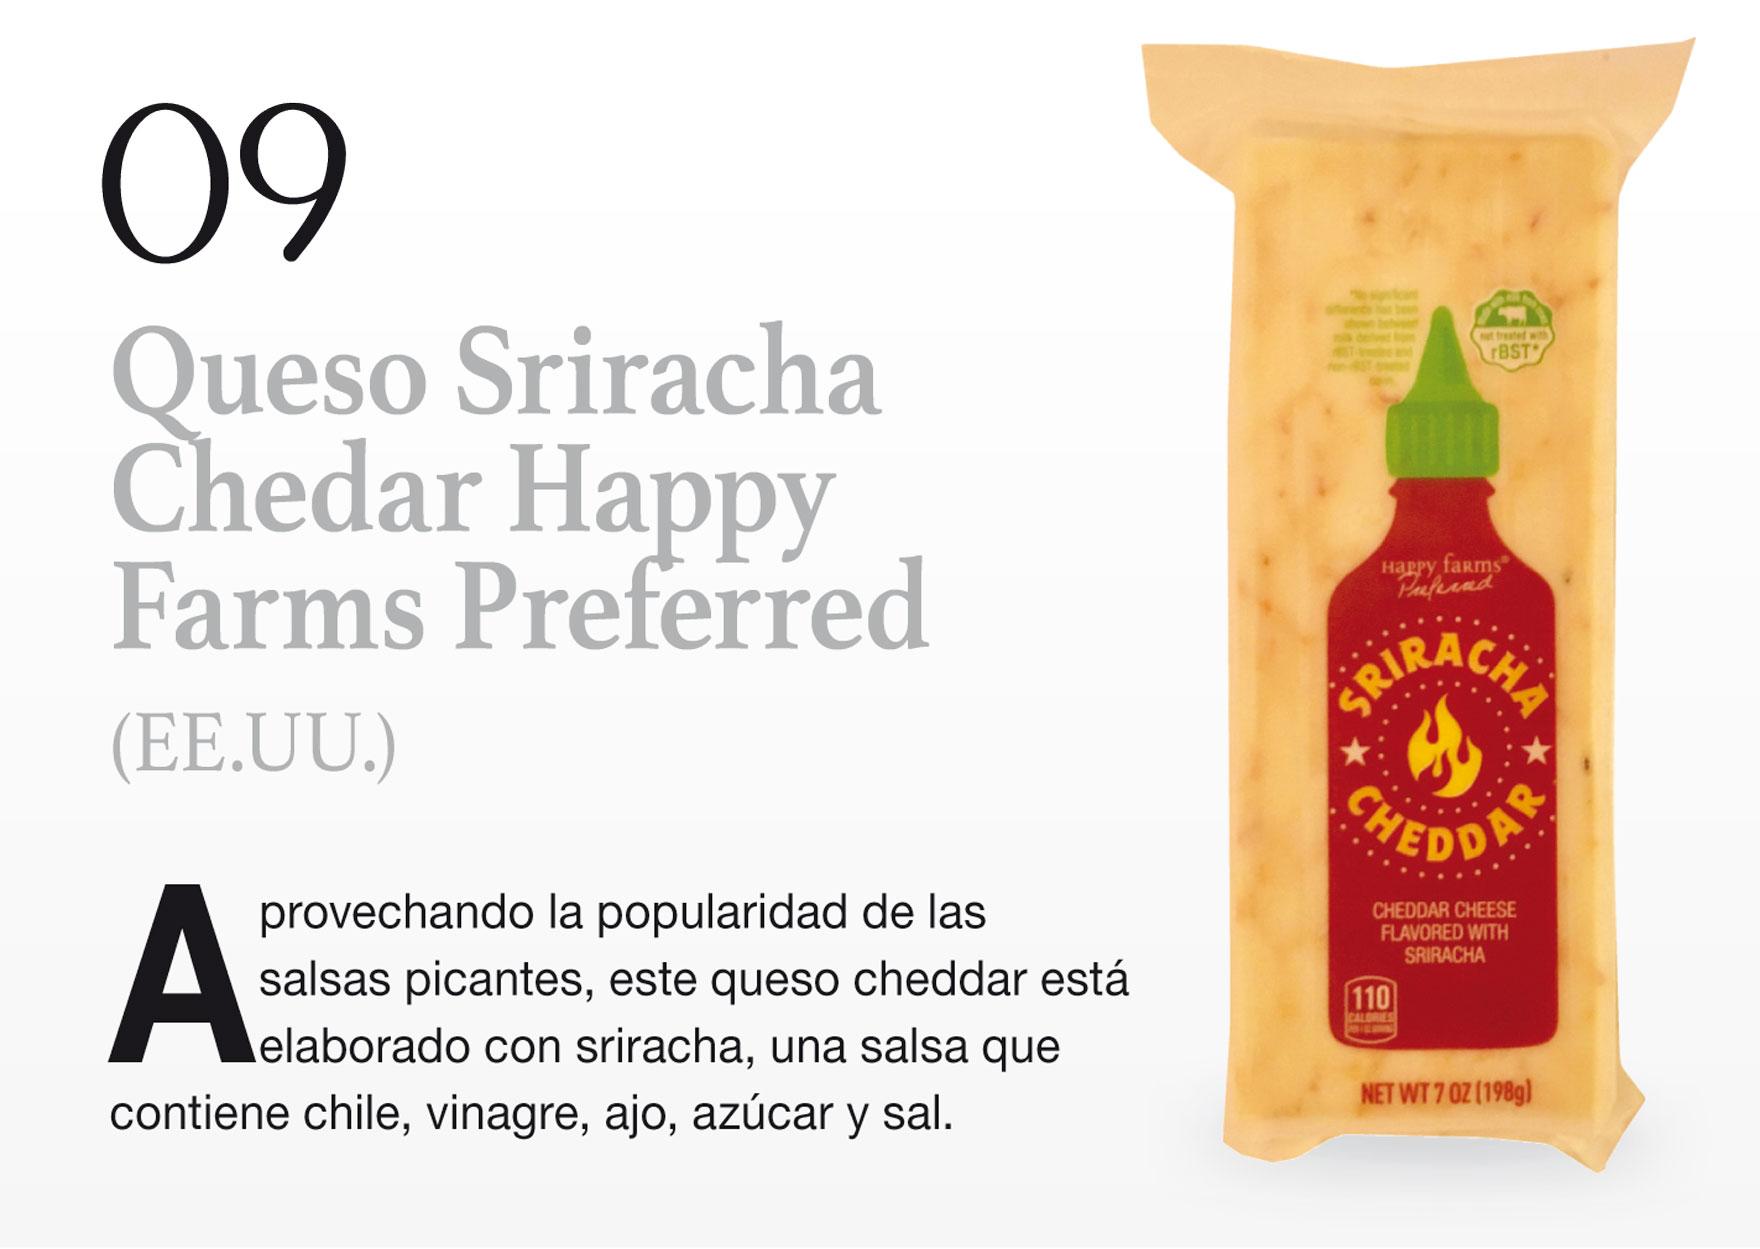 Queso Sriracha Chedar Happy Farms Preferred (EE.UU.)